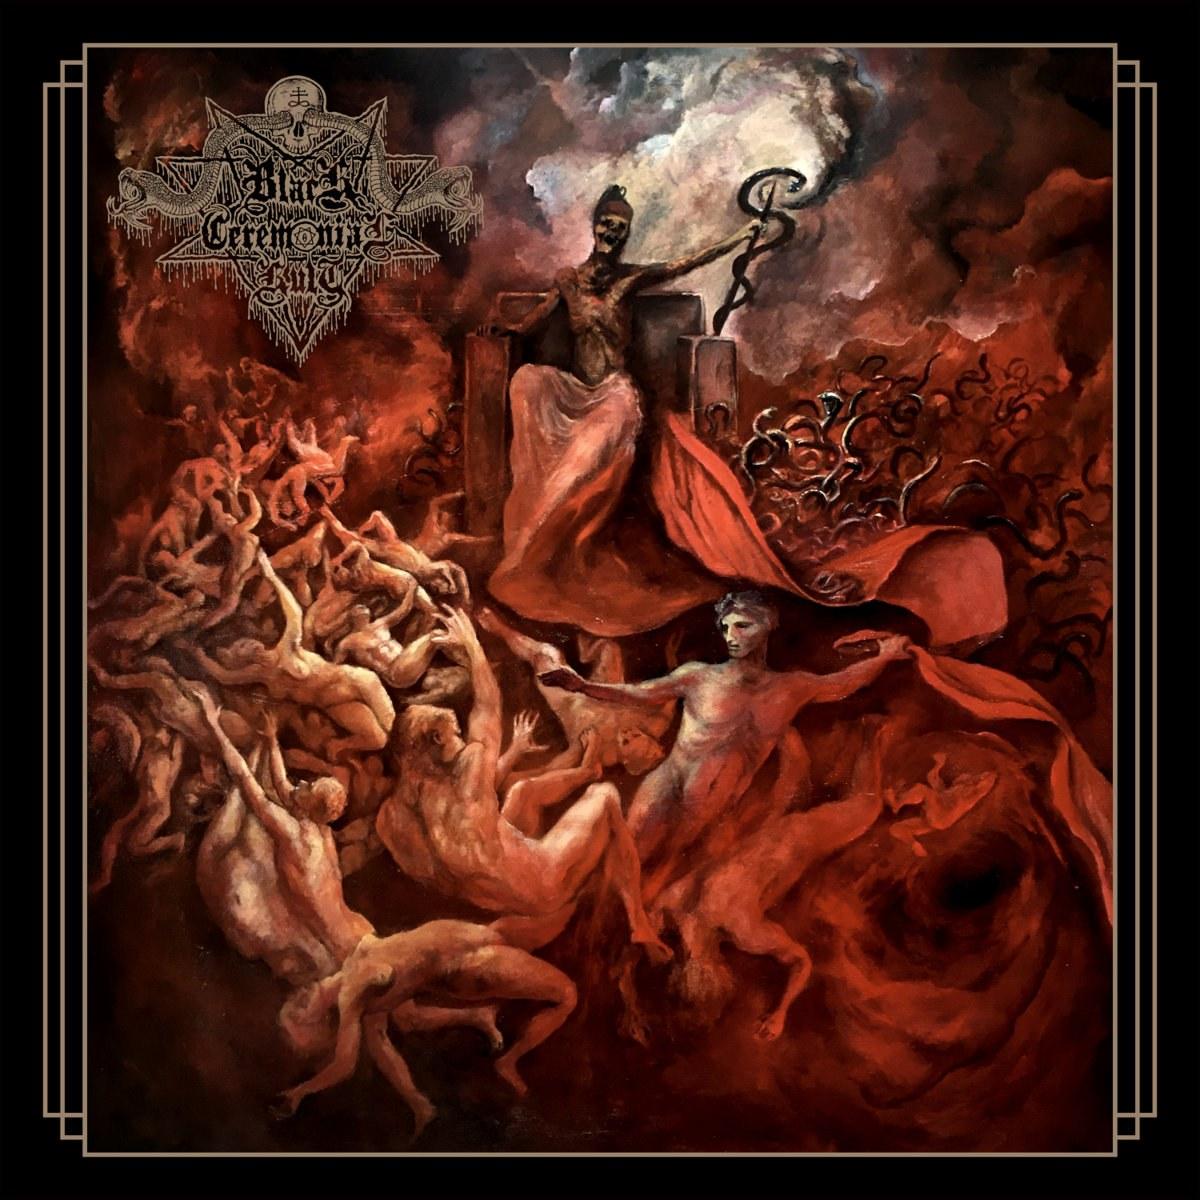 Black Ceremonial Kult - Crowned in Chaos